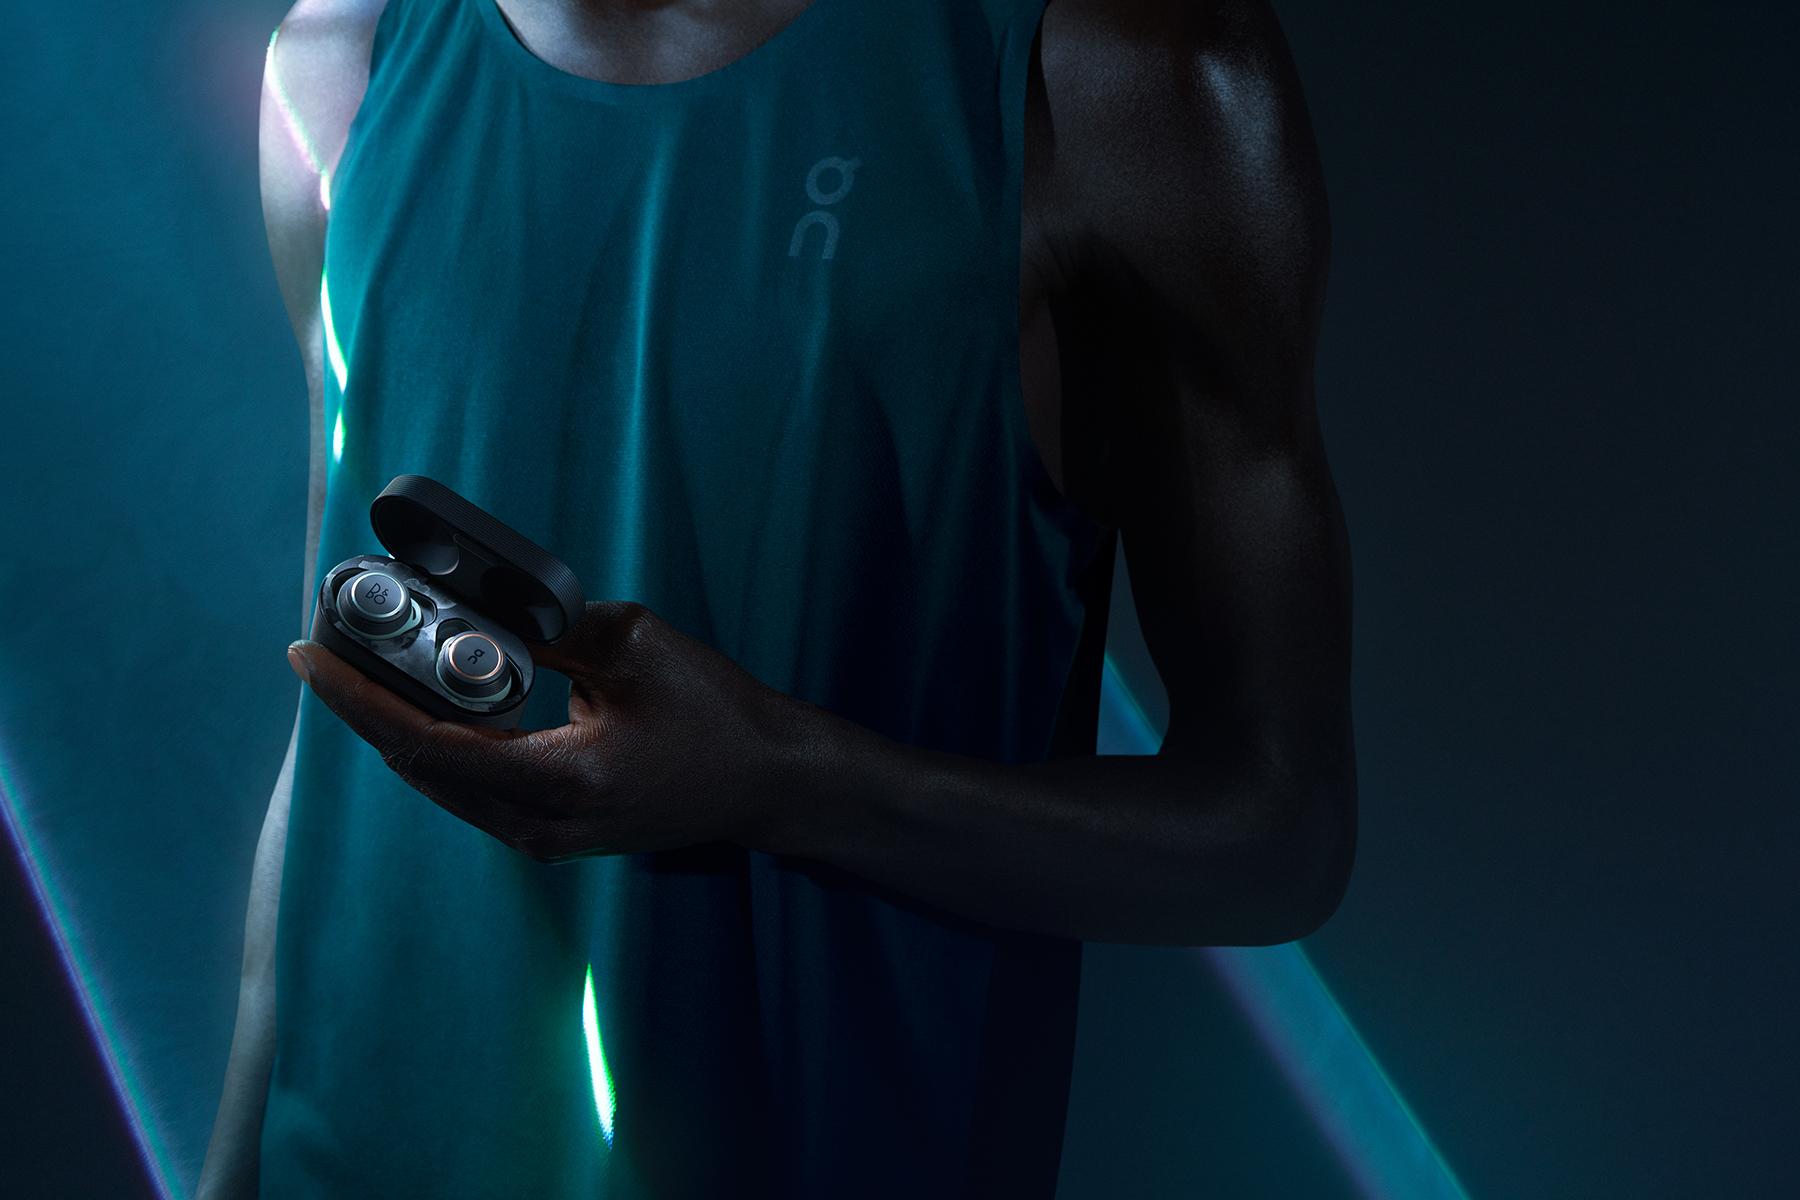 runners-lab-bang-olufsen-e8-sport